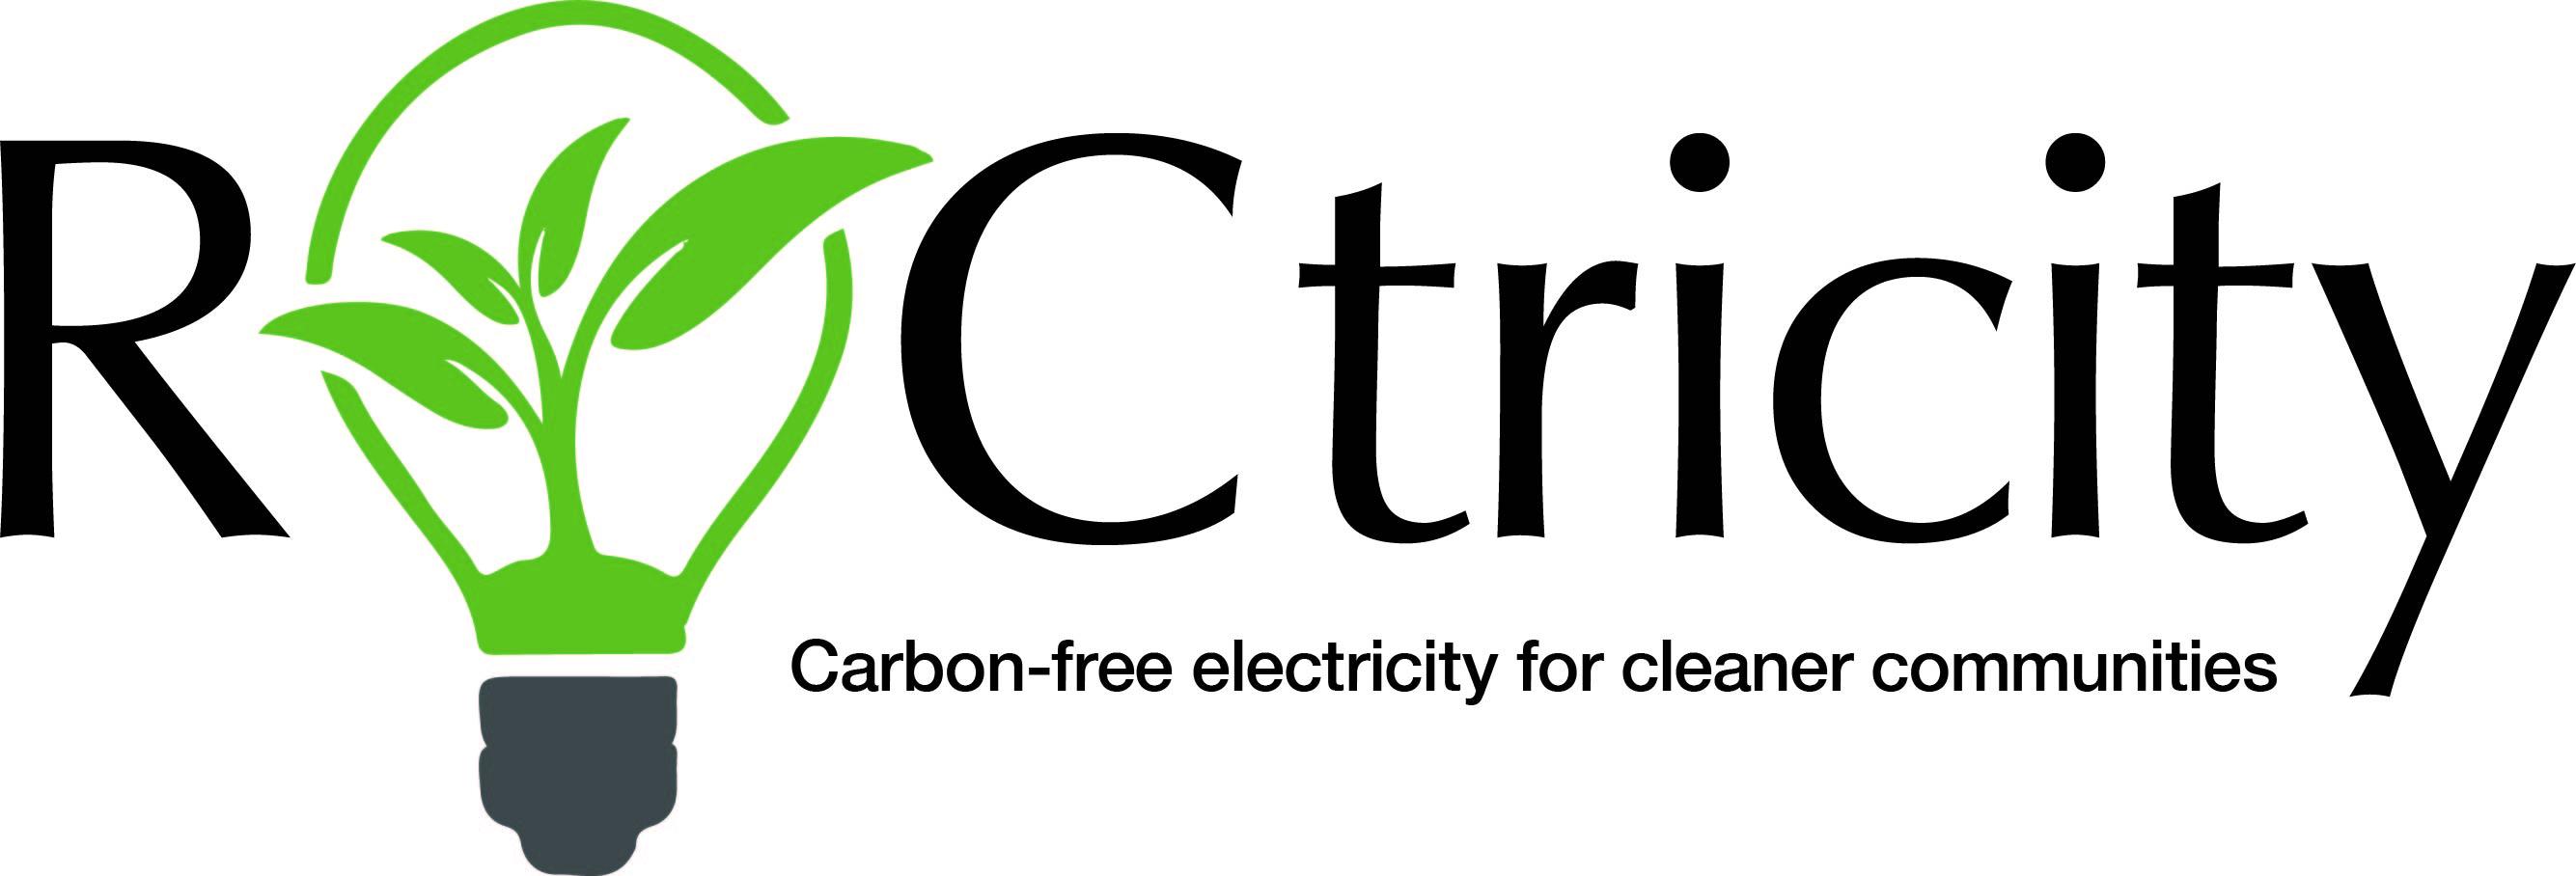 Roctricity logo v3